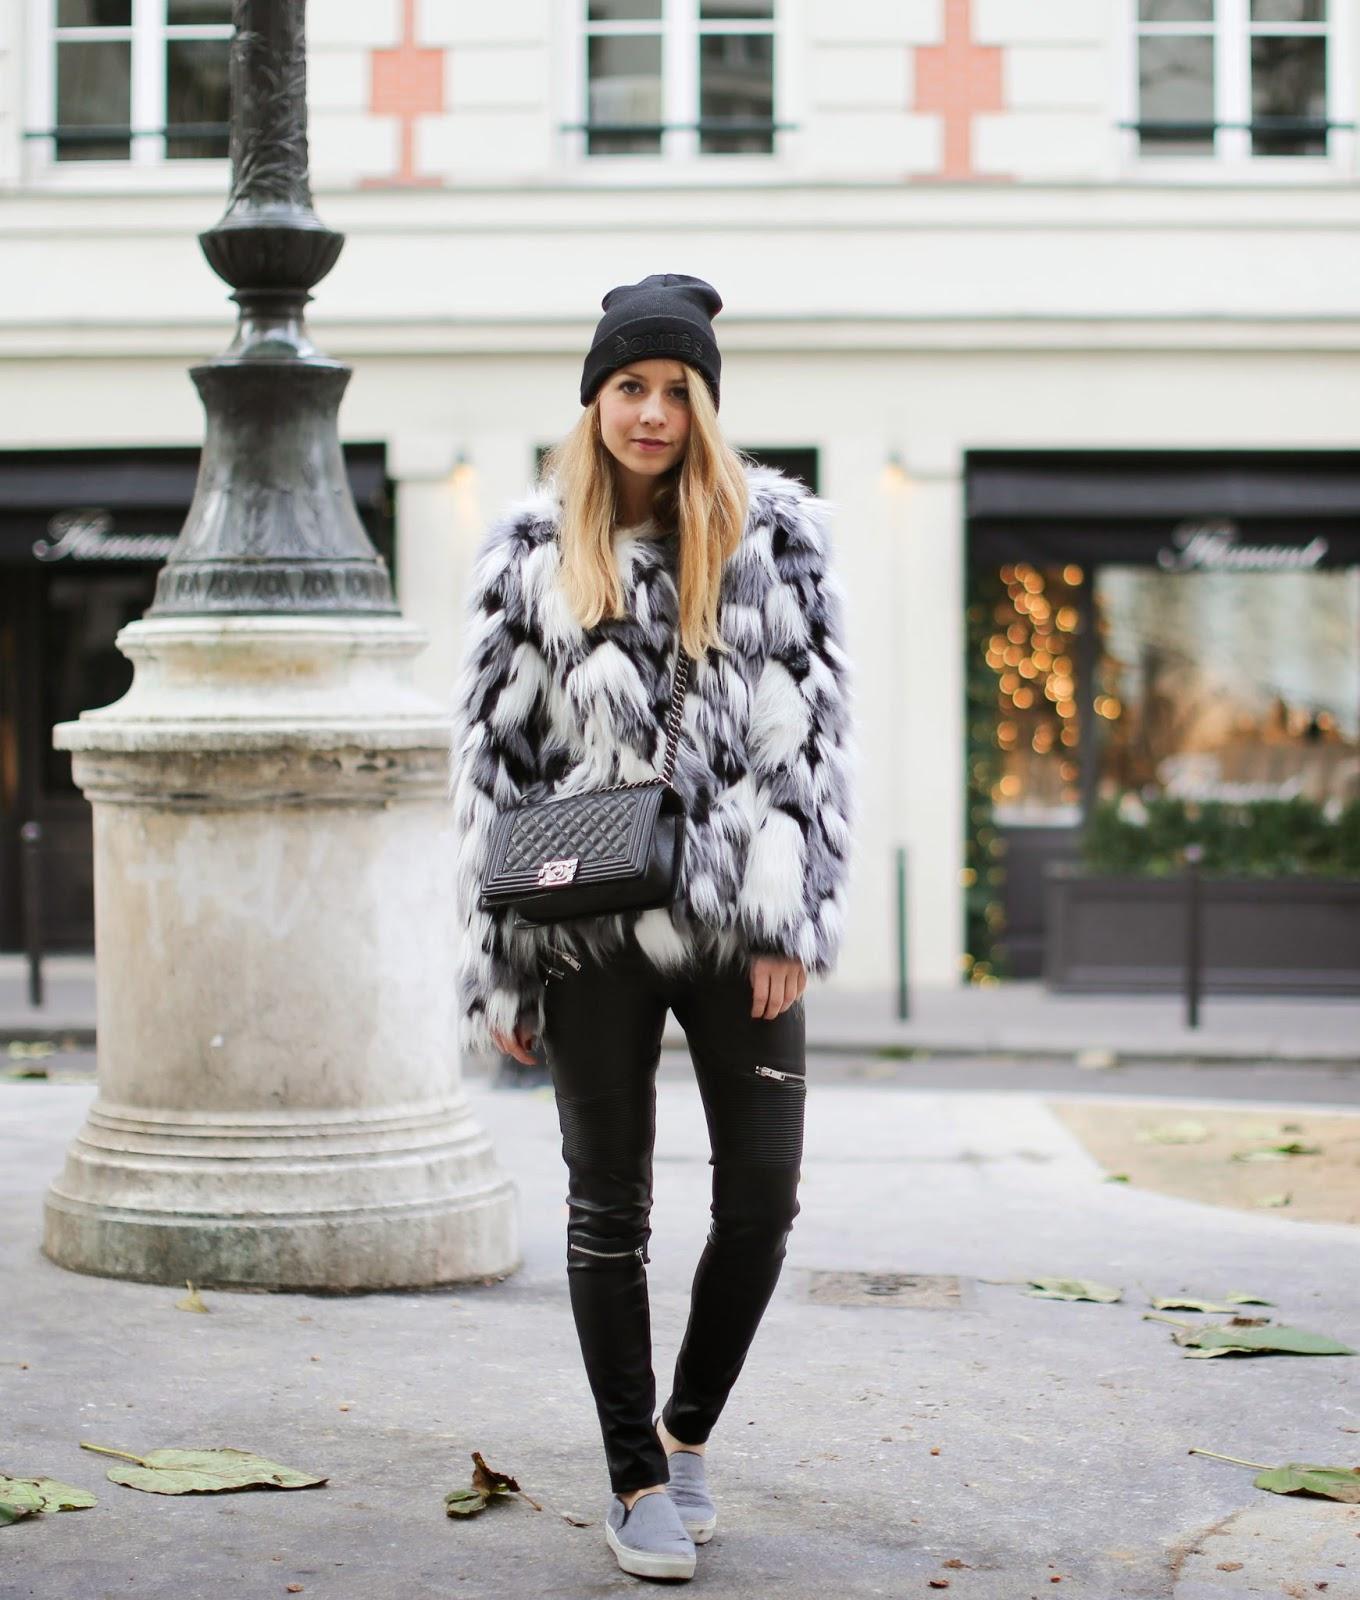 fur, vero moda, beanie homies, céline, zara, biker pants, chanel, fashionblogger, streetstyle, paris